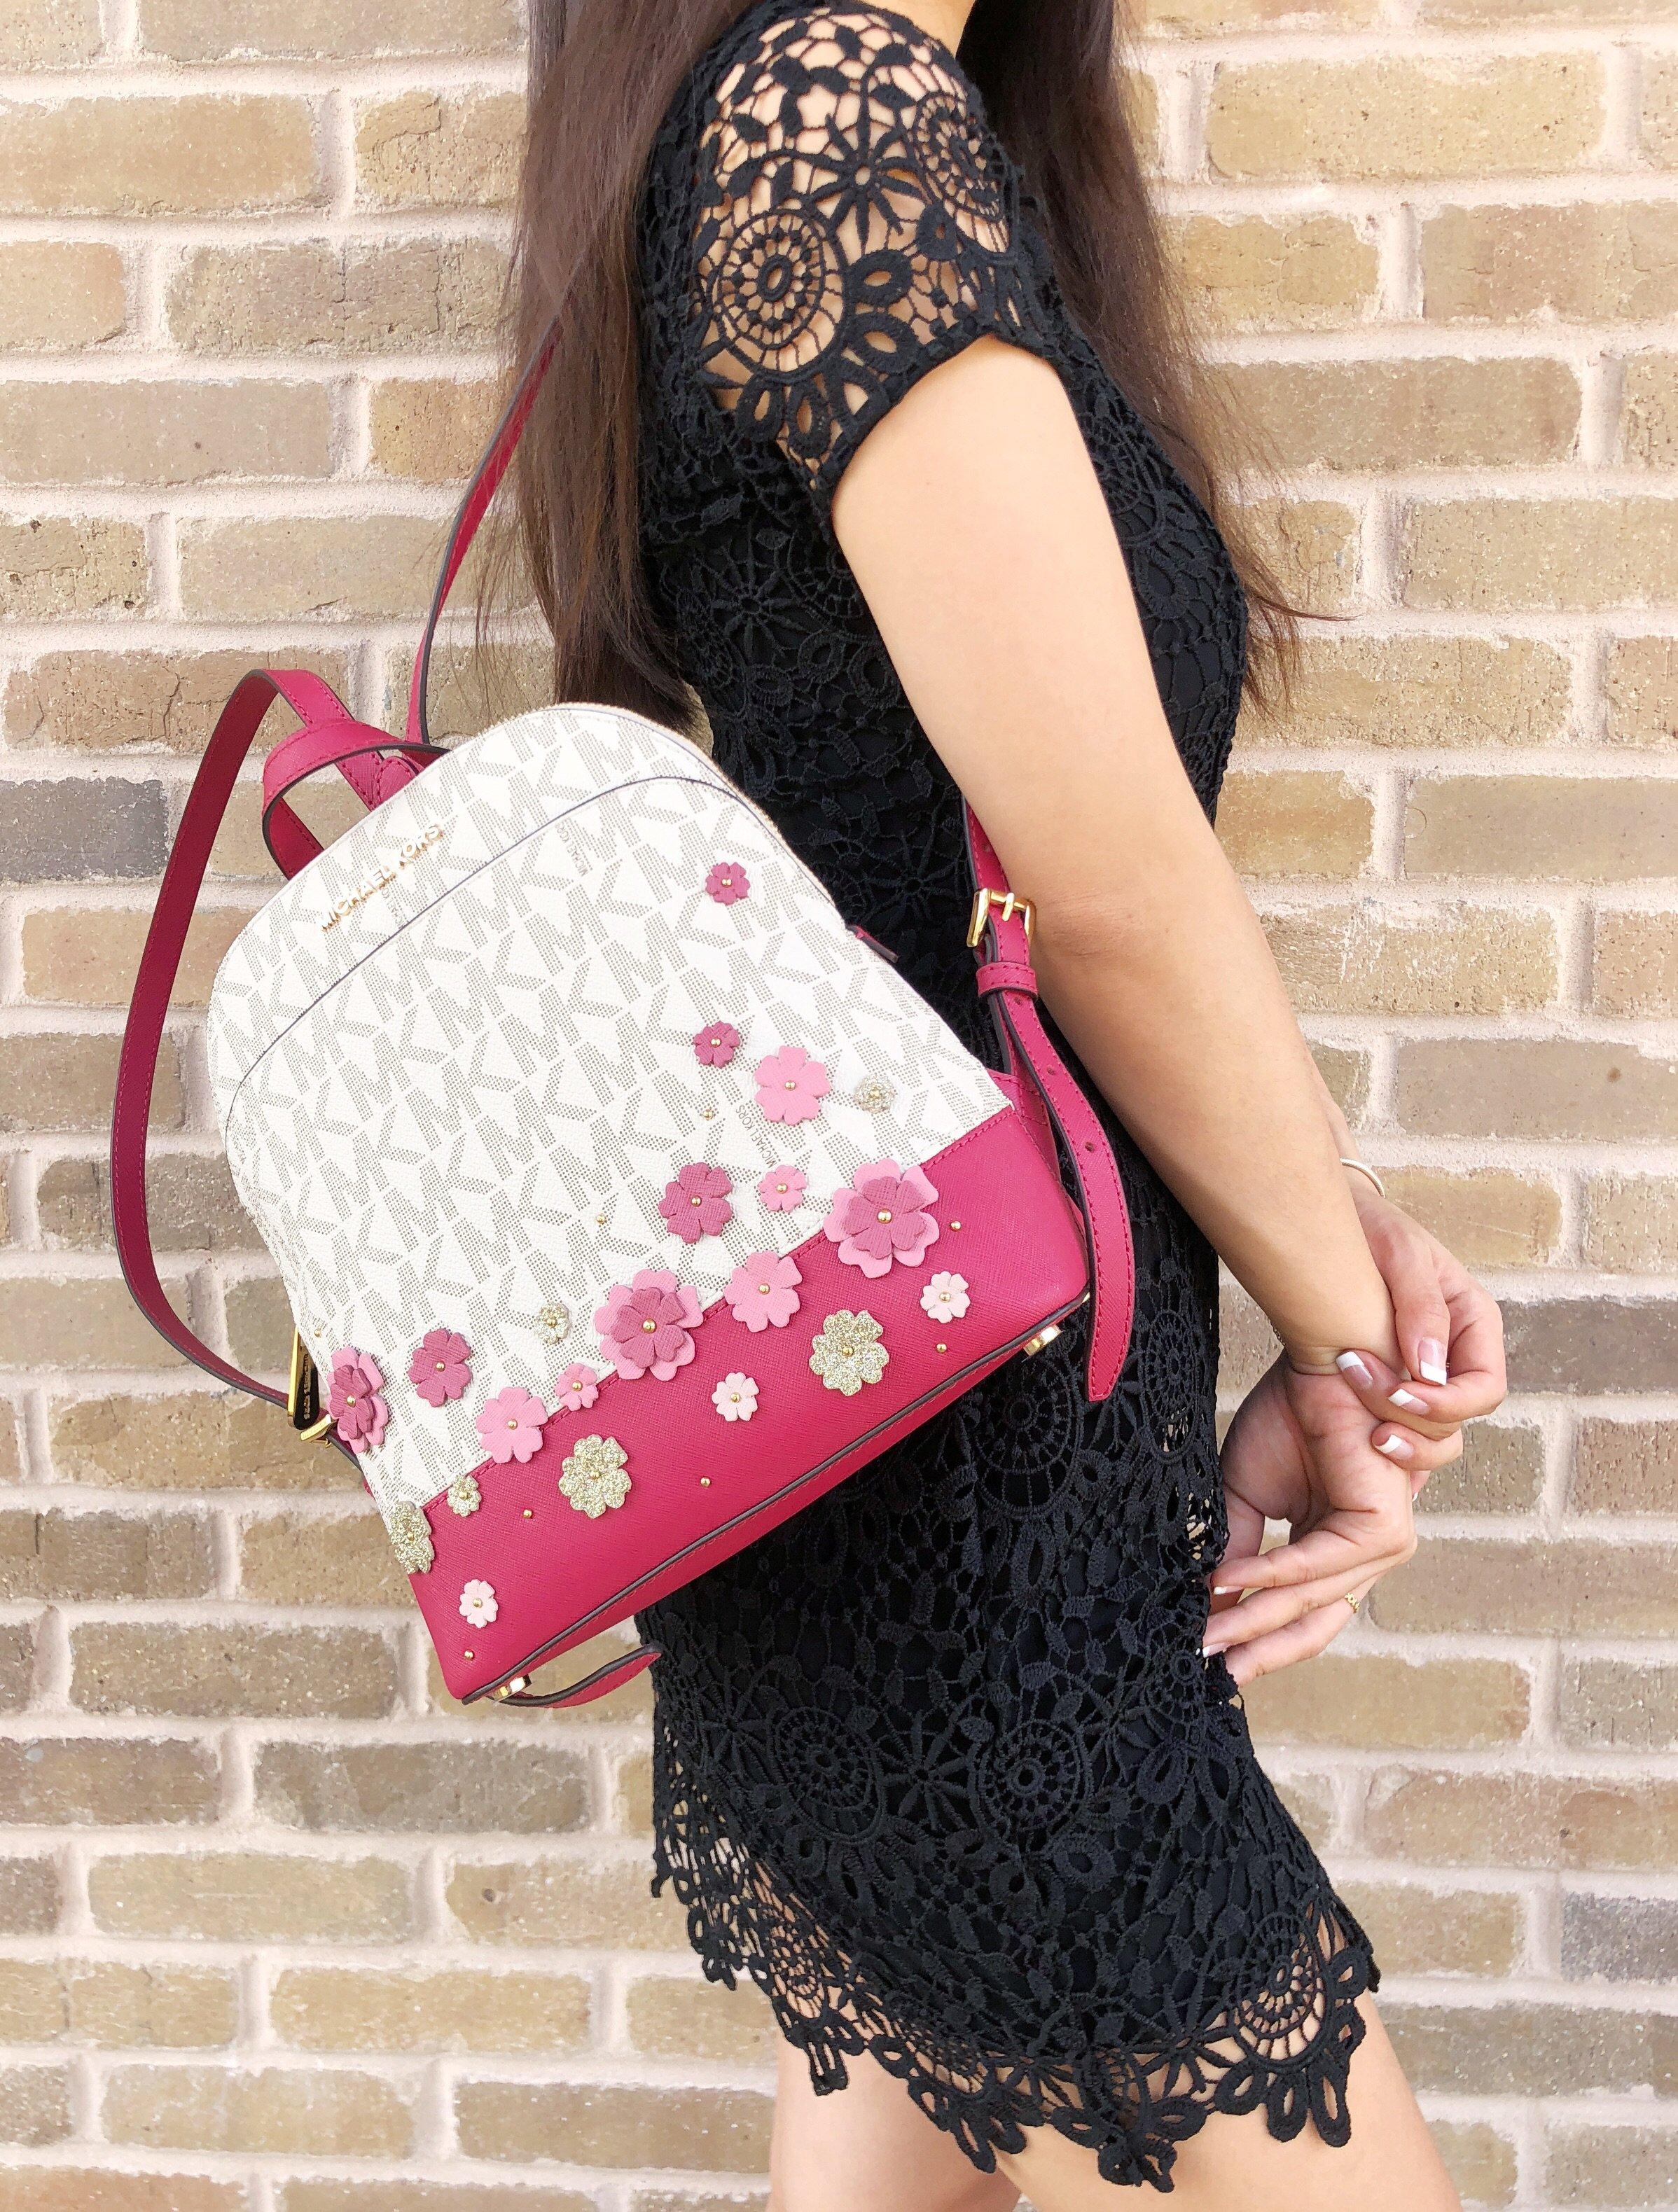 064e4844138c57 NWT Michael Kors Emmy Small Backpack Vanilla MK Signature Pink ...